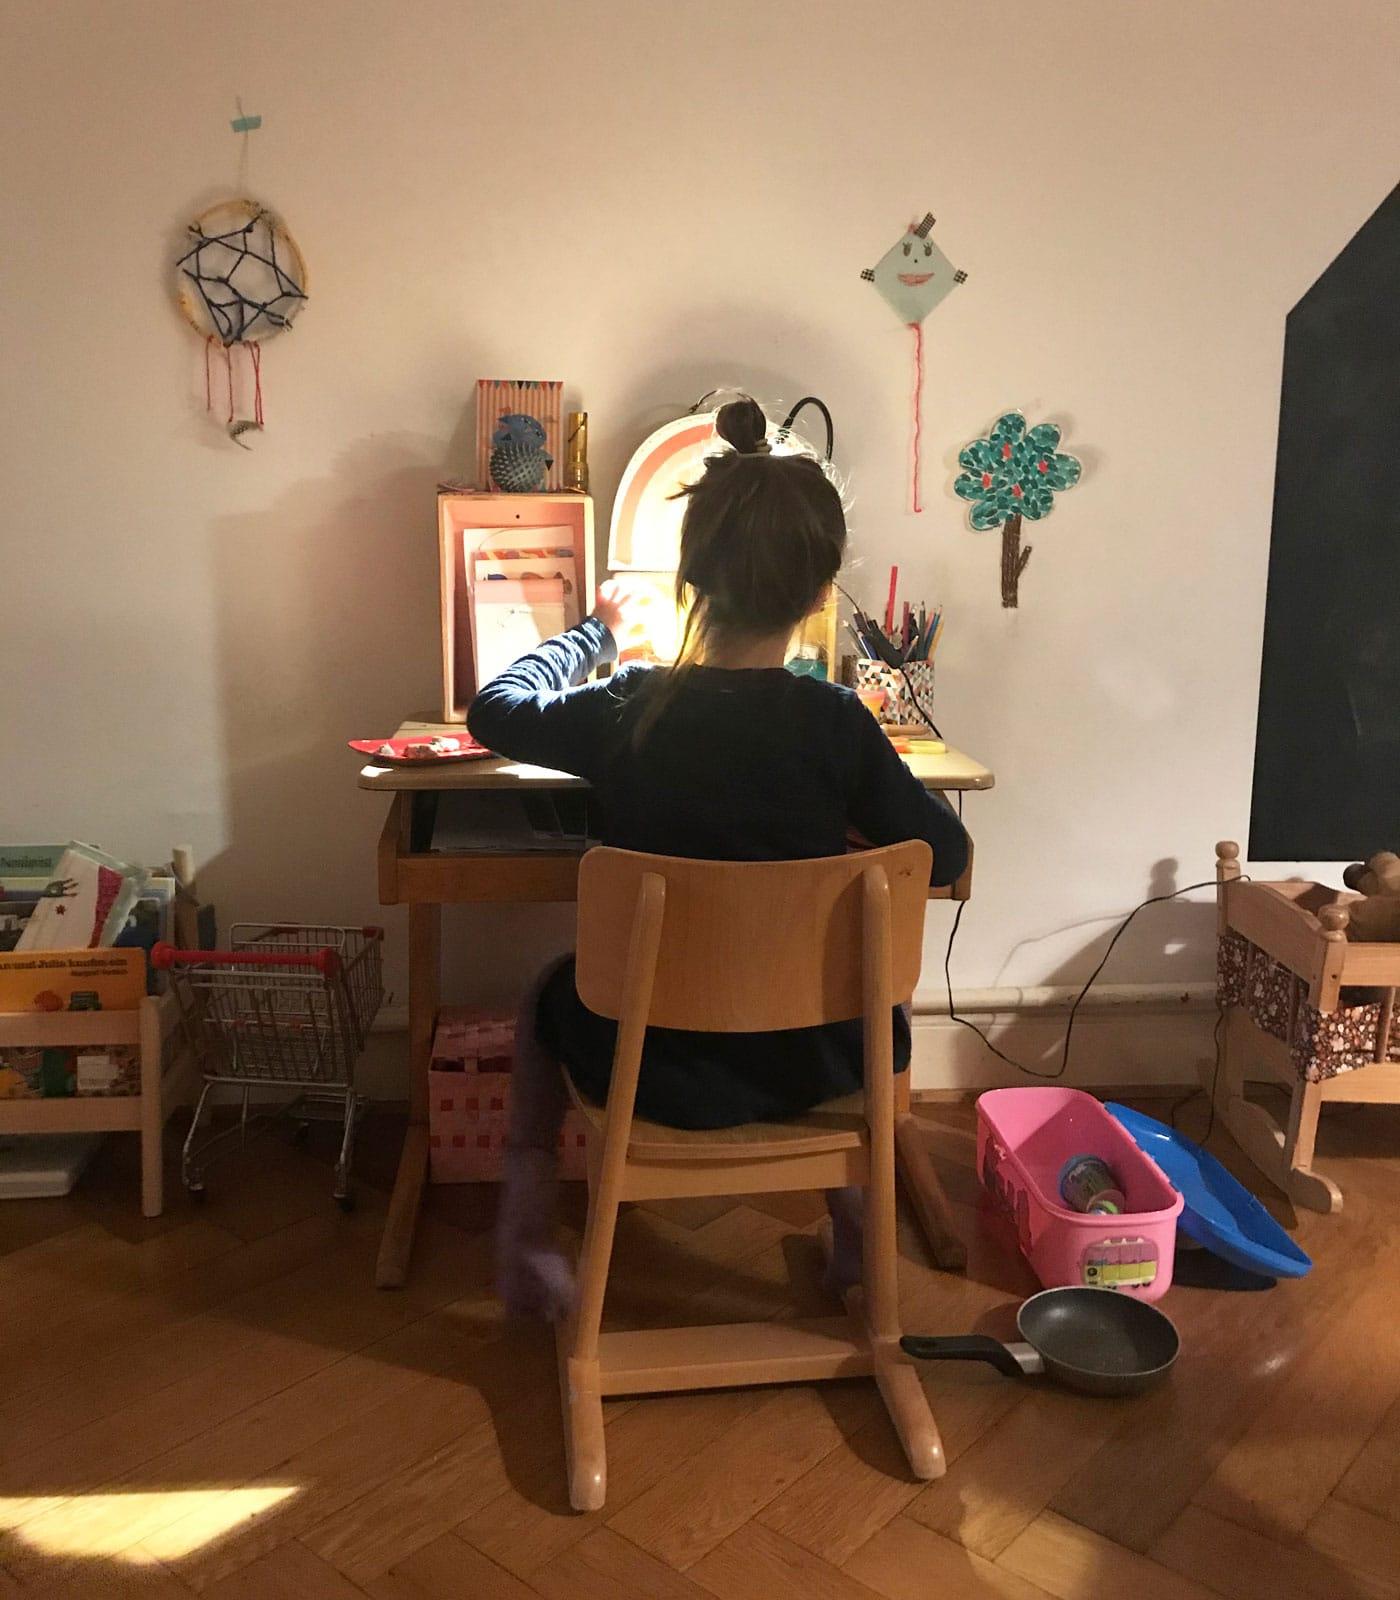 Kinderzimmer-Stimmung // HIMBEER